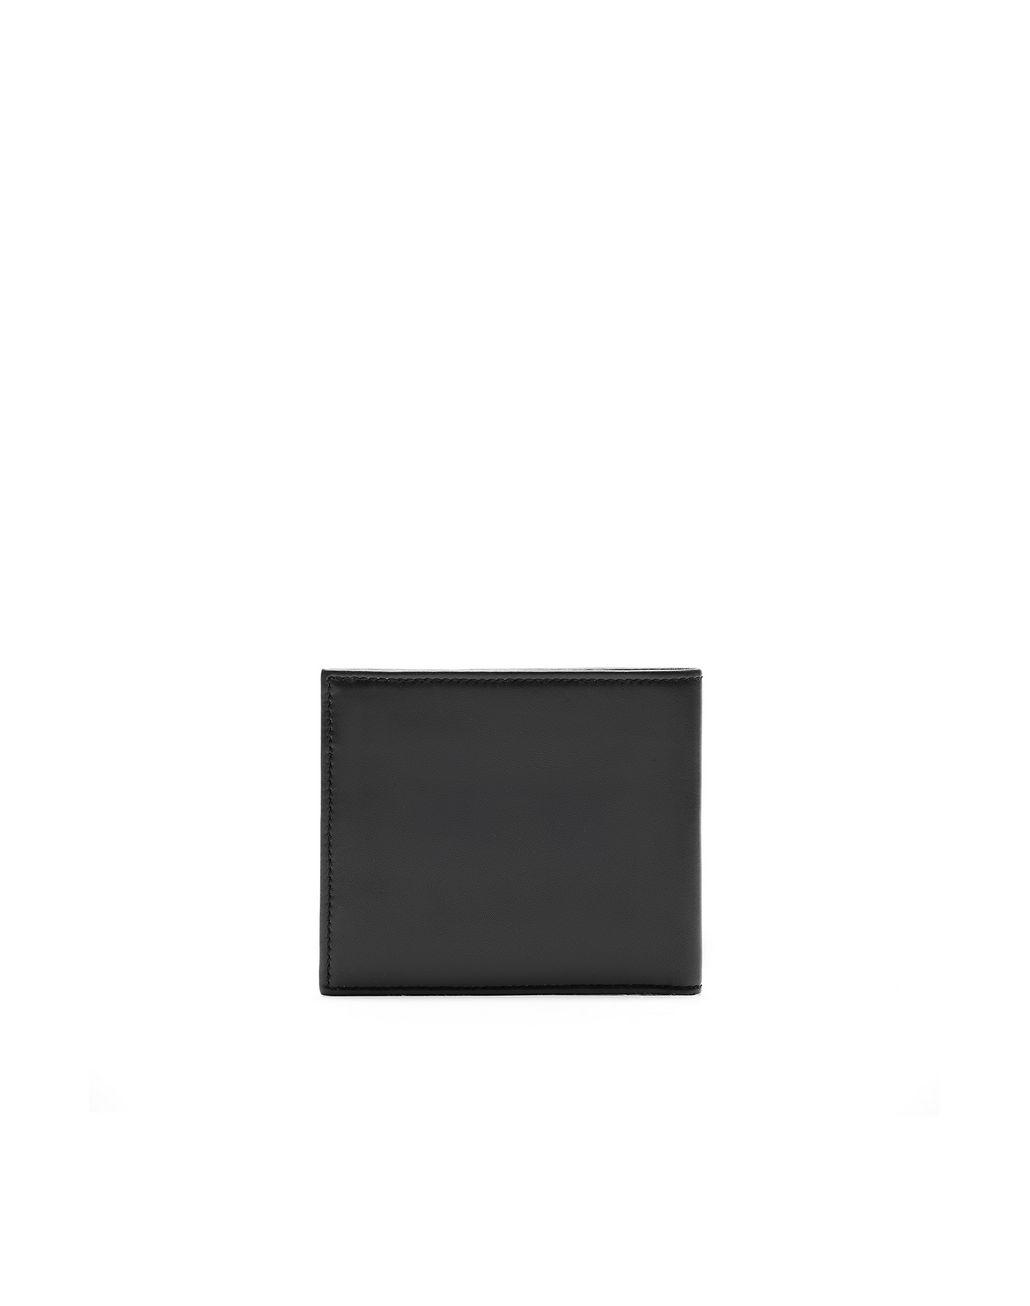 BRIONI Black Calfskin Wallet Wallet Man d